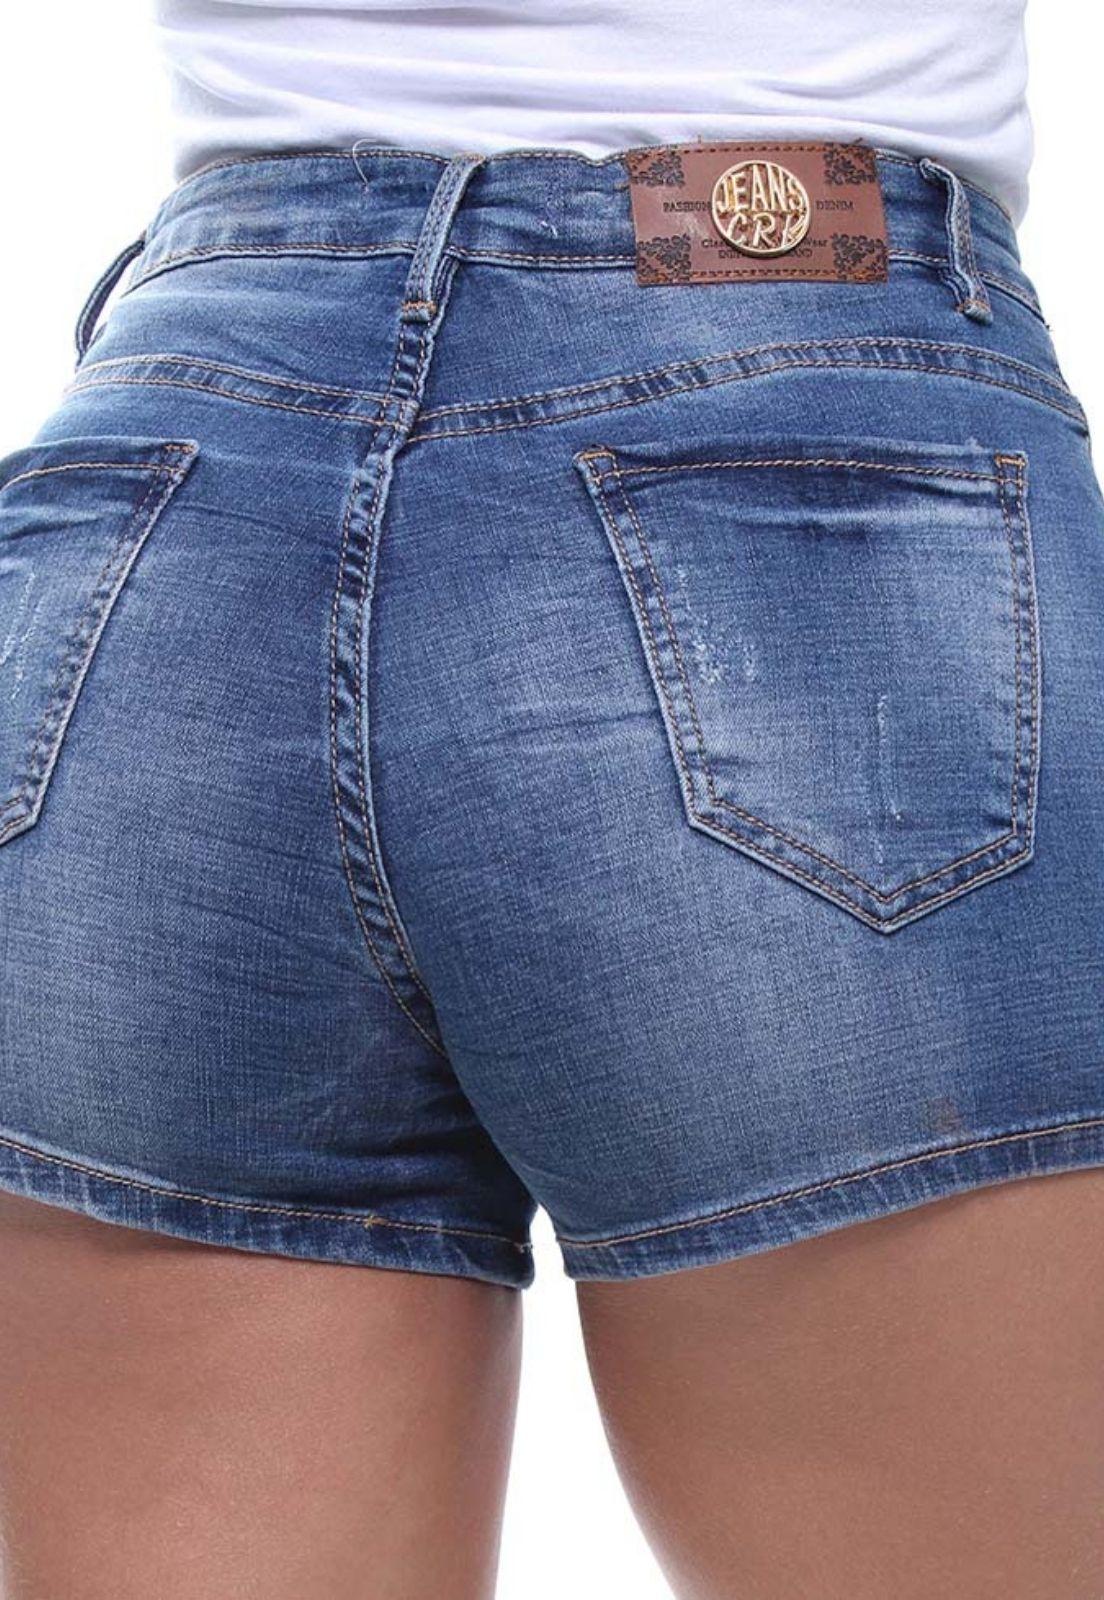 Shorts Jeans Feminino Slim Médio Crocker - 46471  - CROCKER JEANS